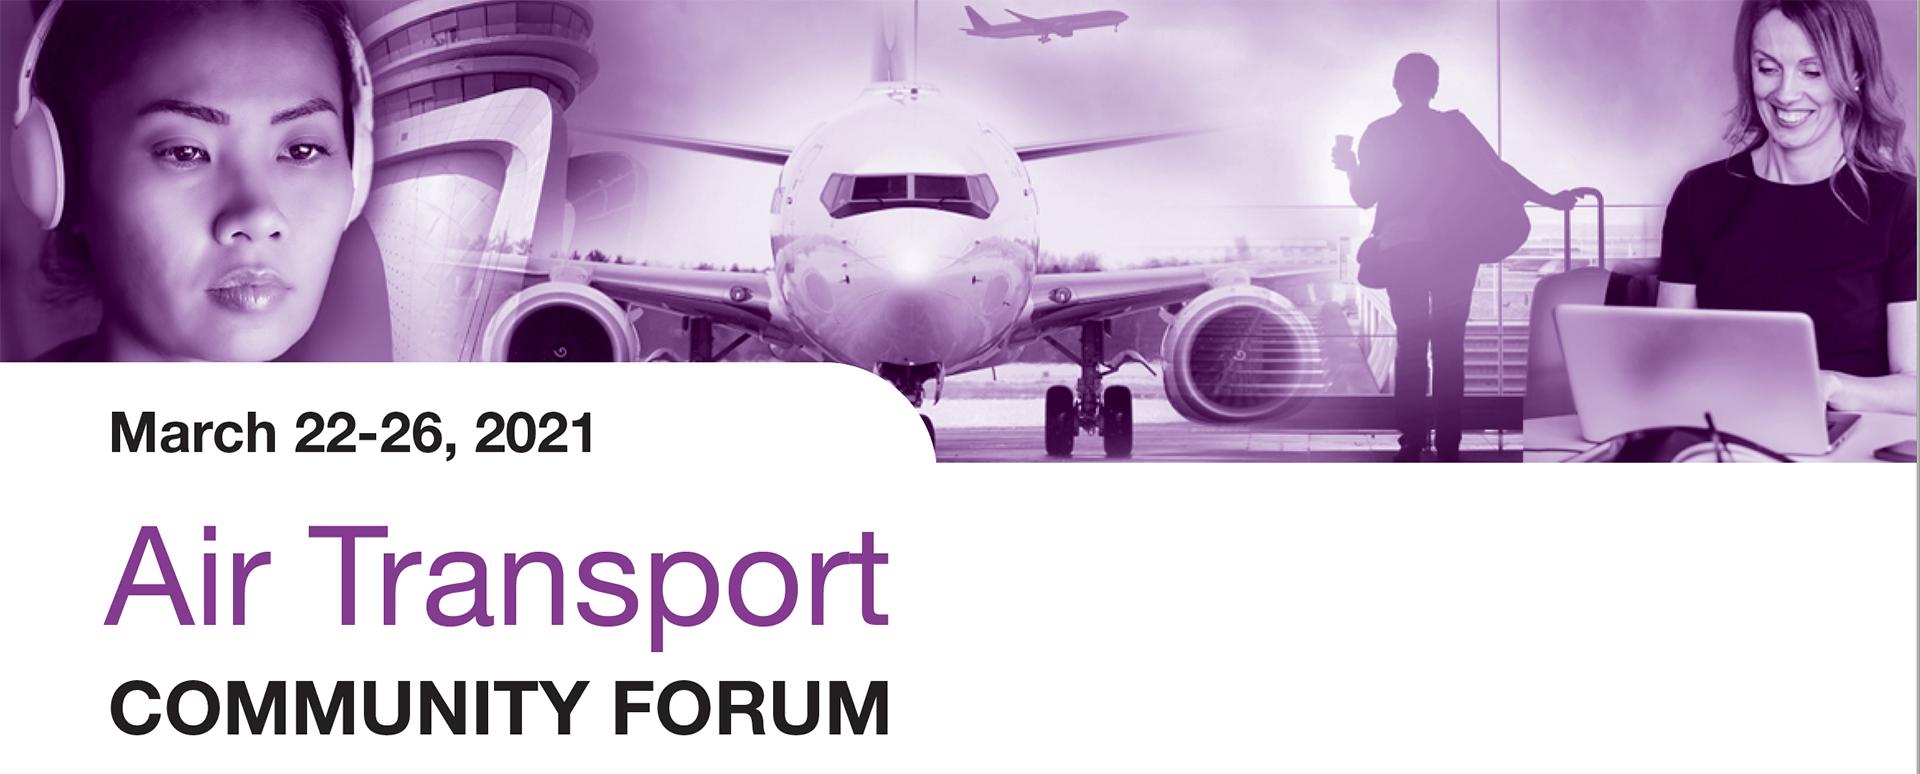 Air Transport Community Forum